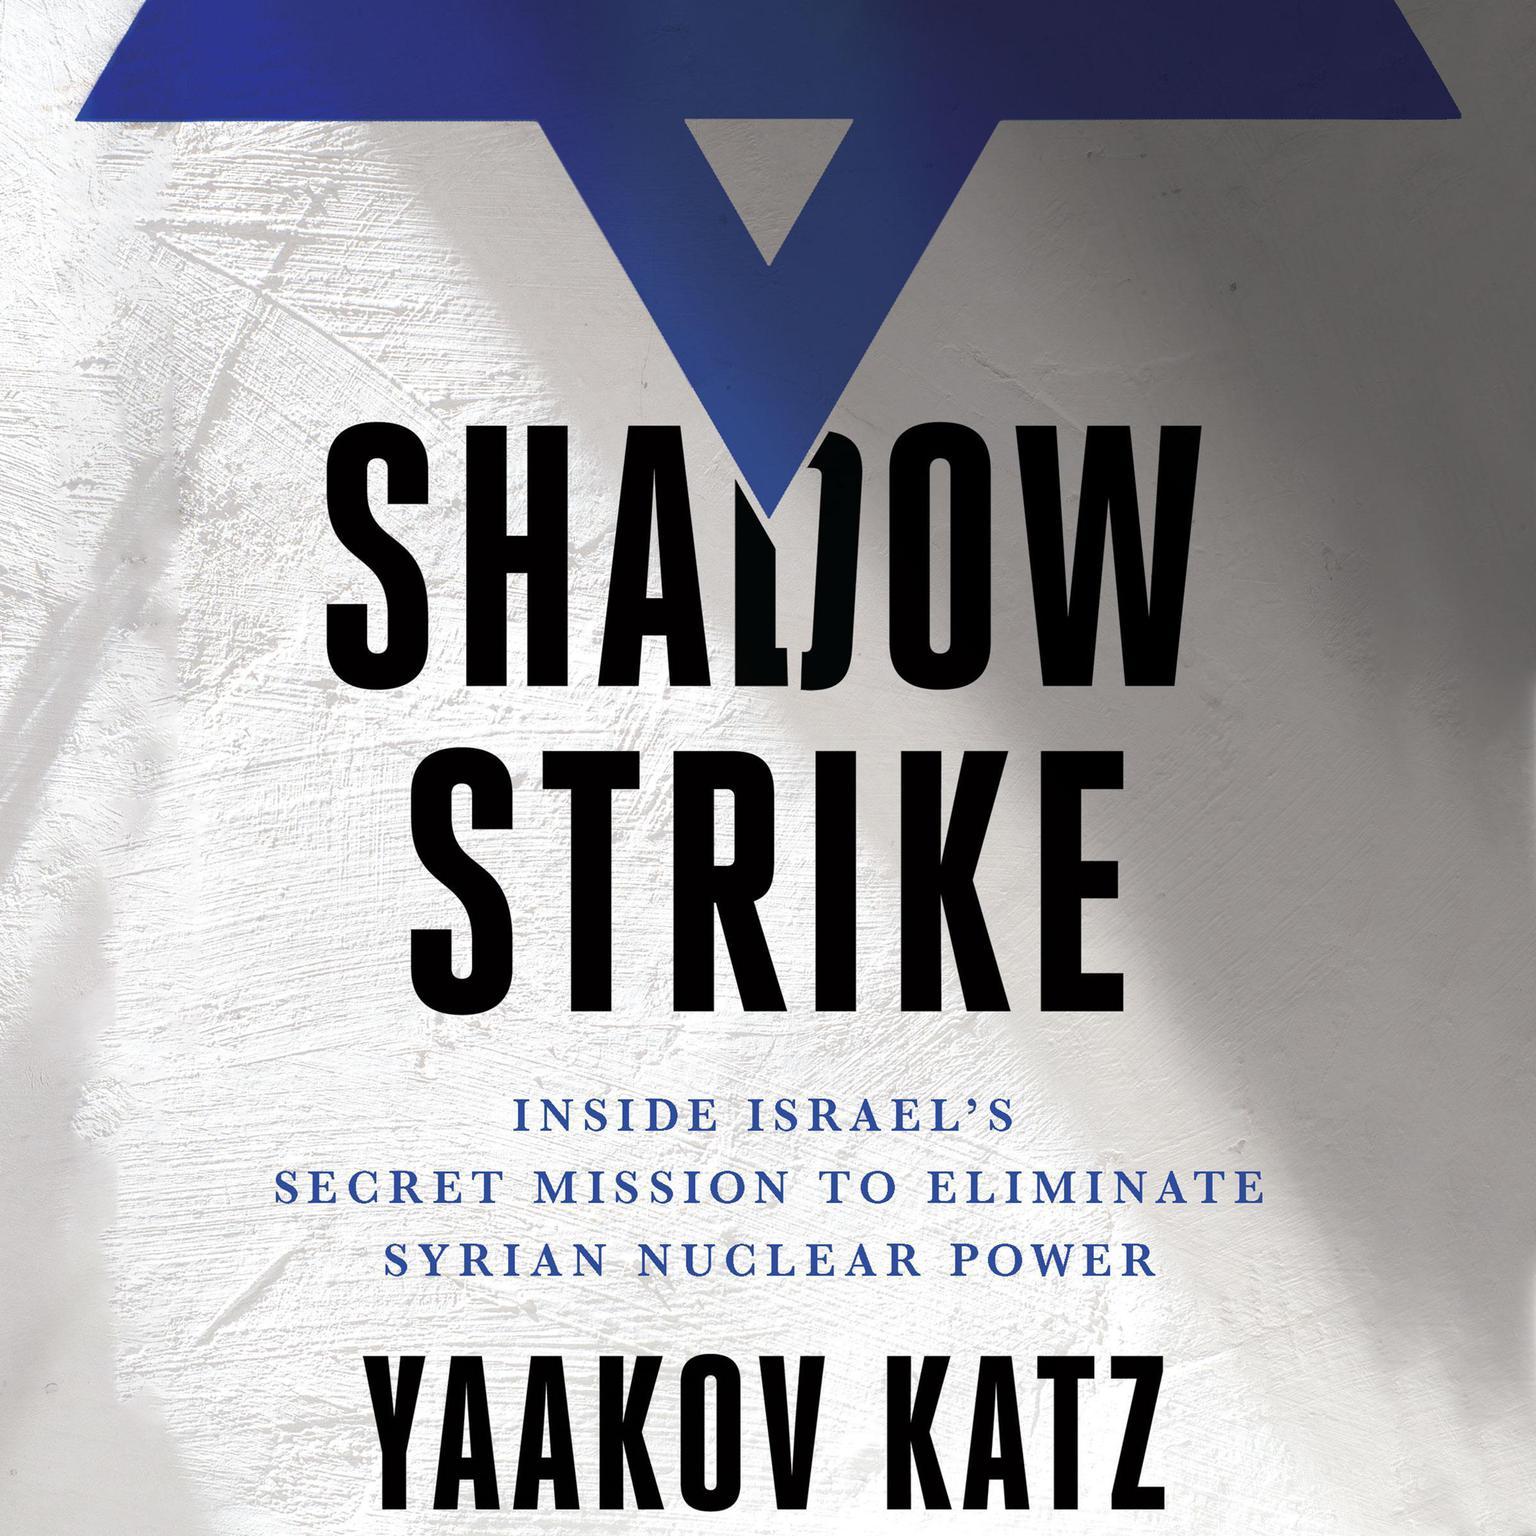 Shadow Strike: Inside Israels Secret Mission to Eliminate Syrian Nuclear Power Audiobook, by Yaakov Katz